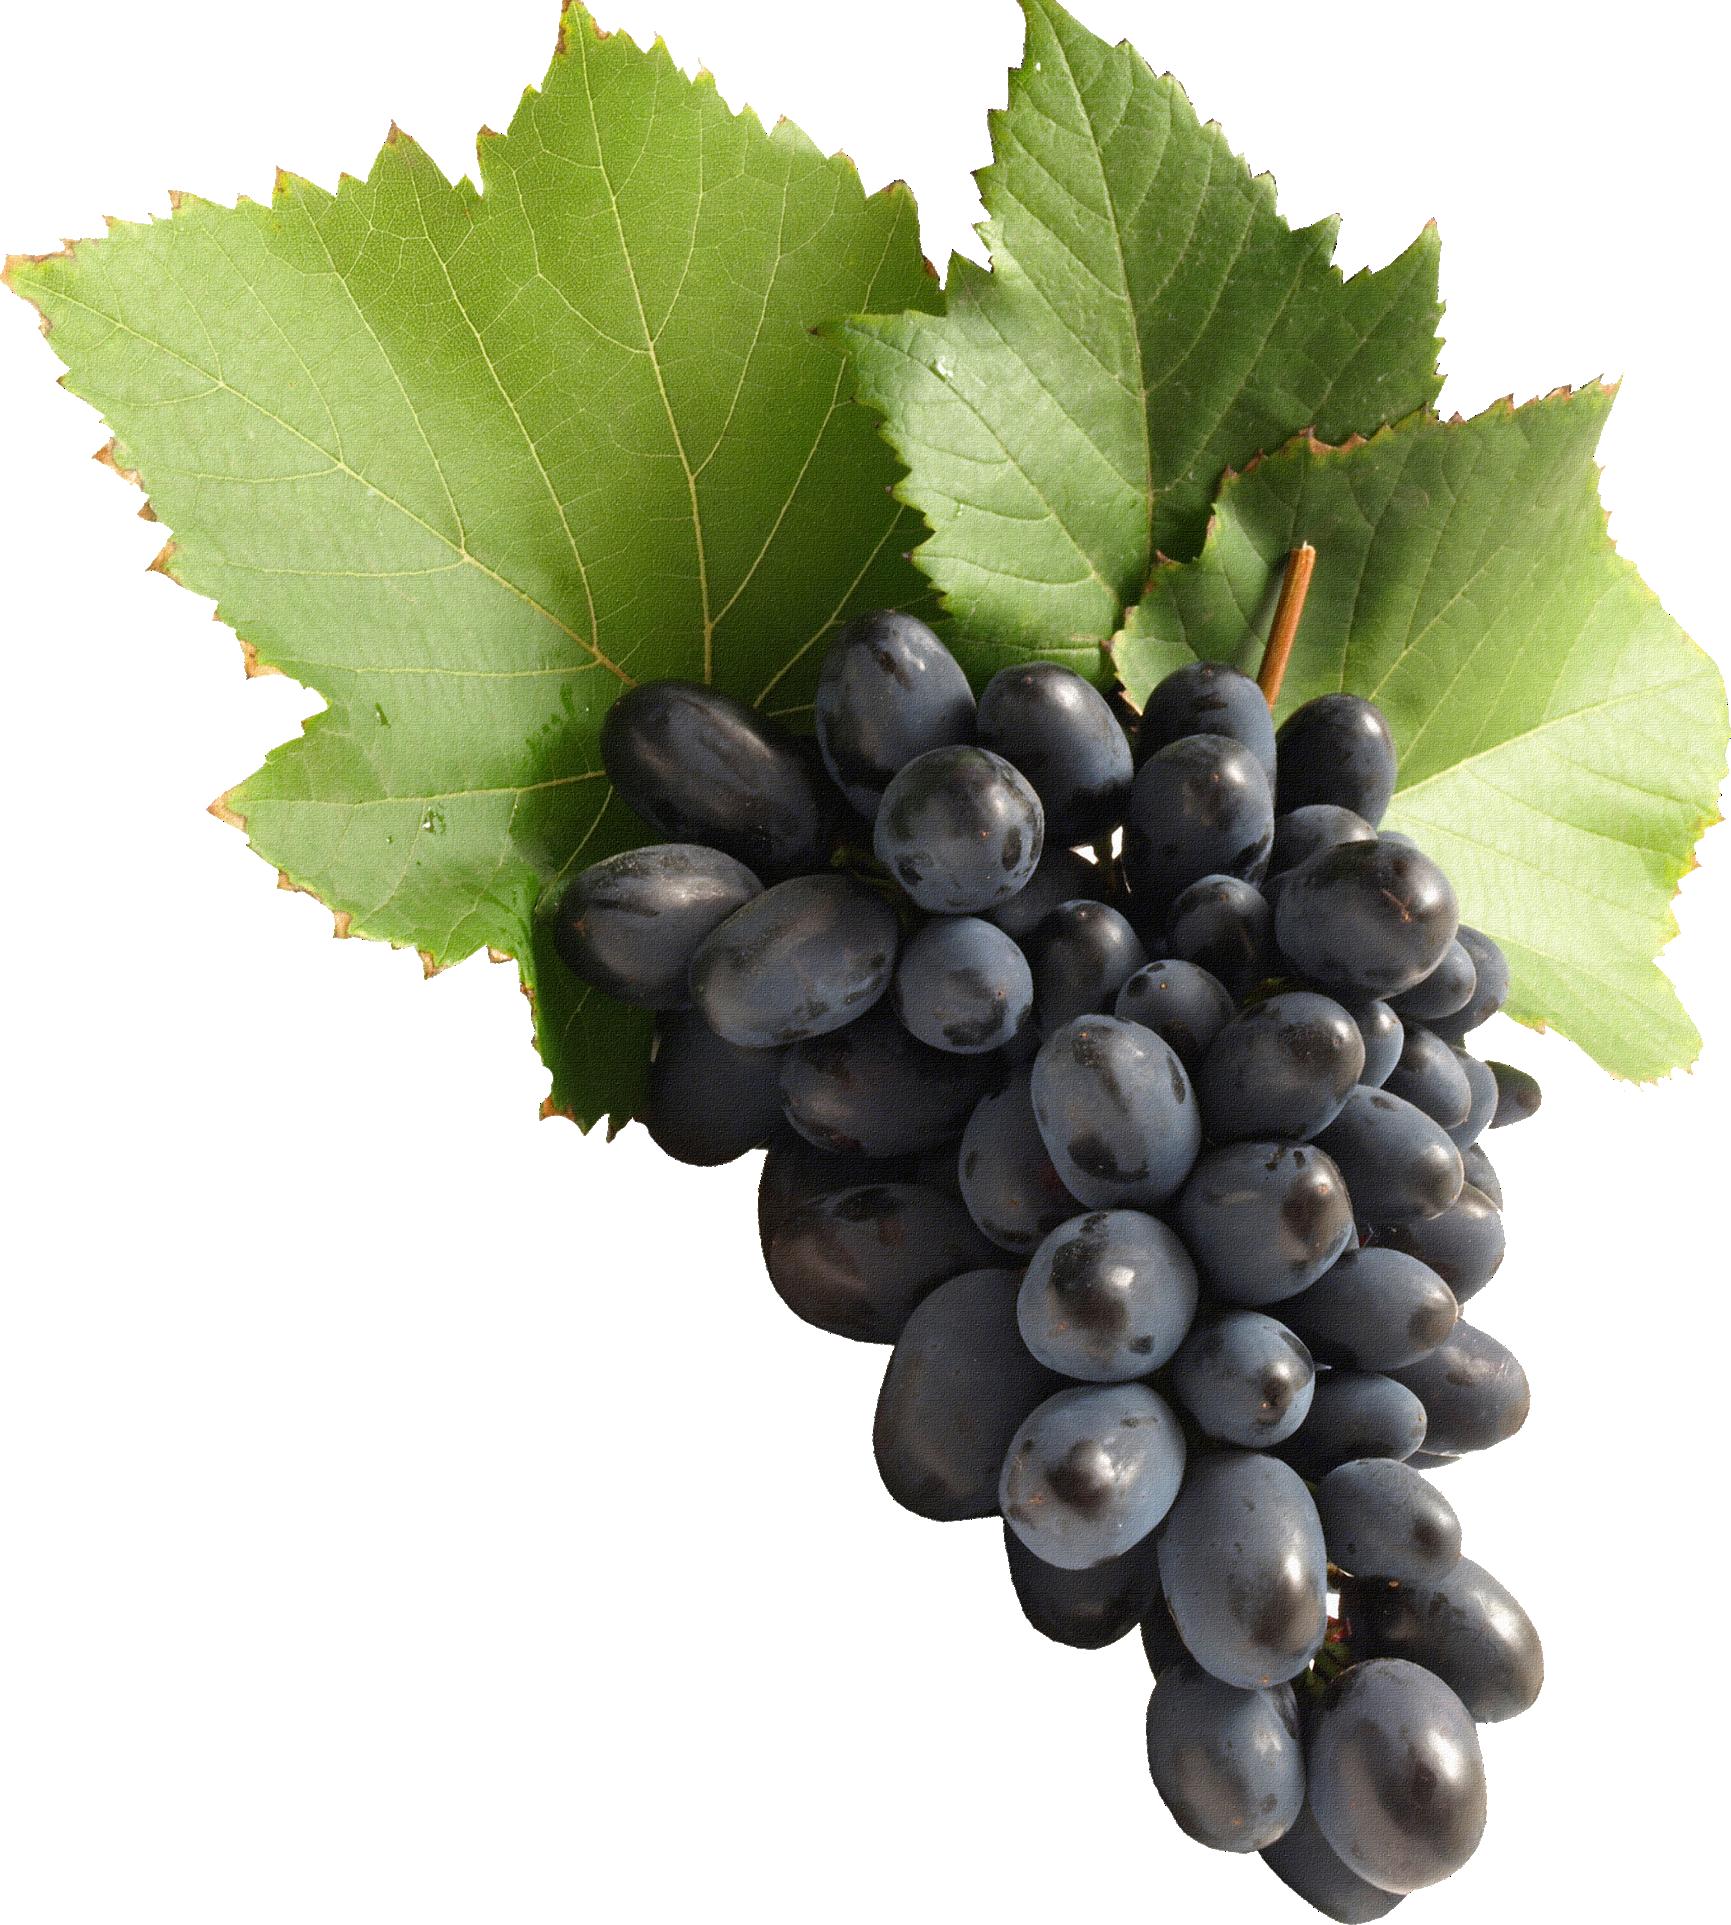 Black Grapes PNG Image